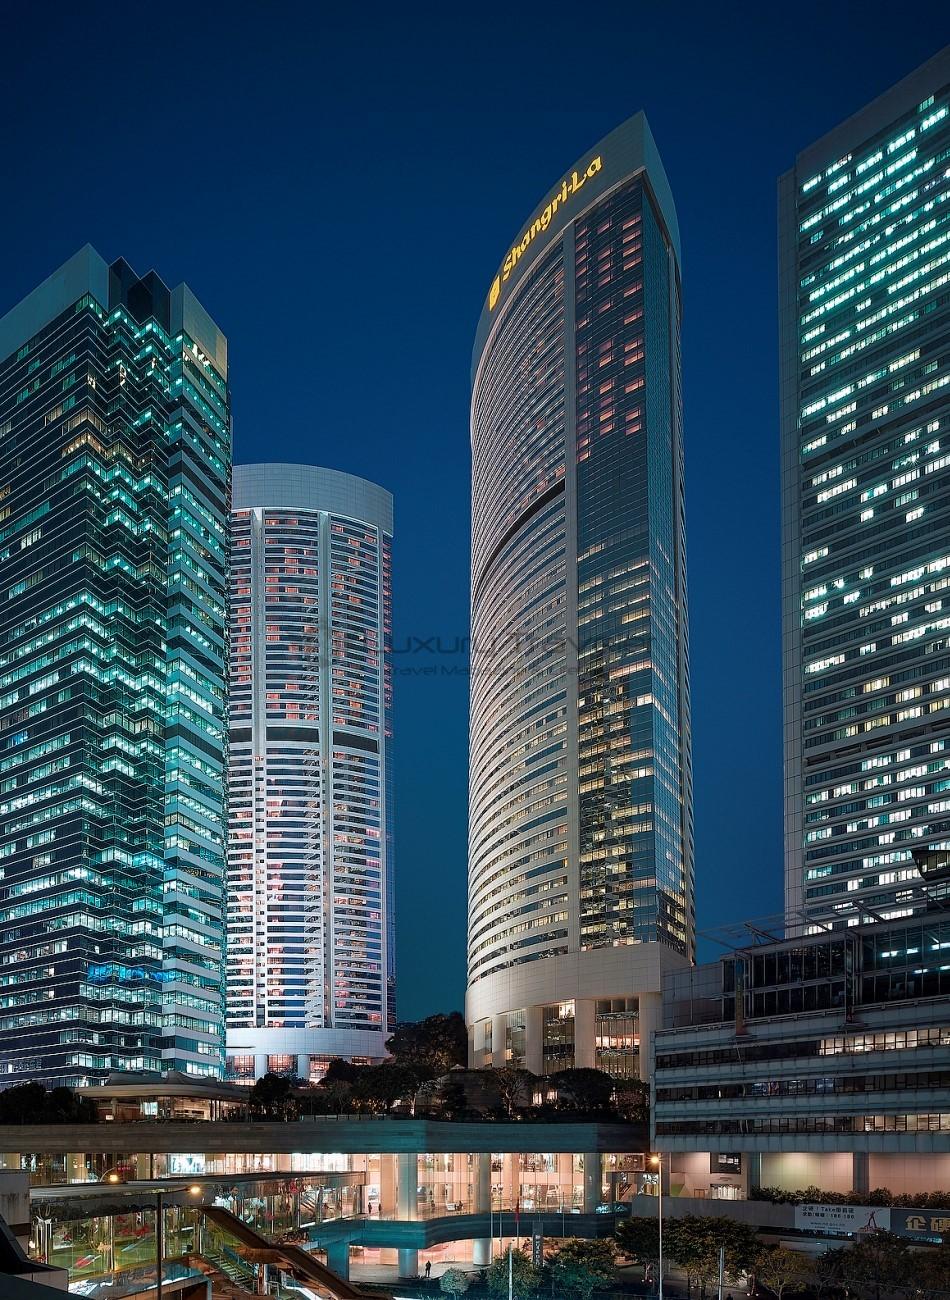 Island_Shangri-La_Hotel_Hong_Kong_Exterior_Location